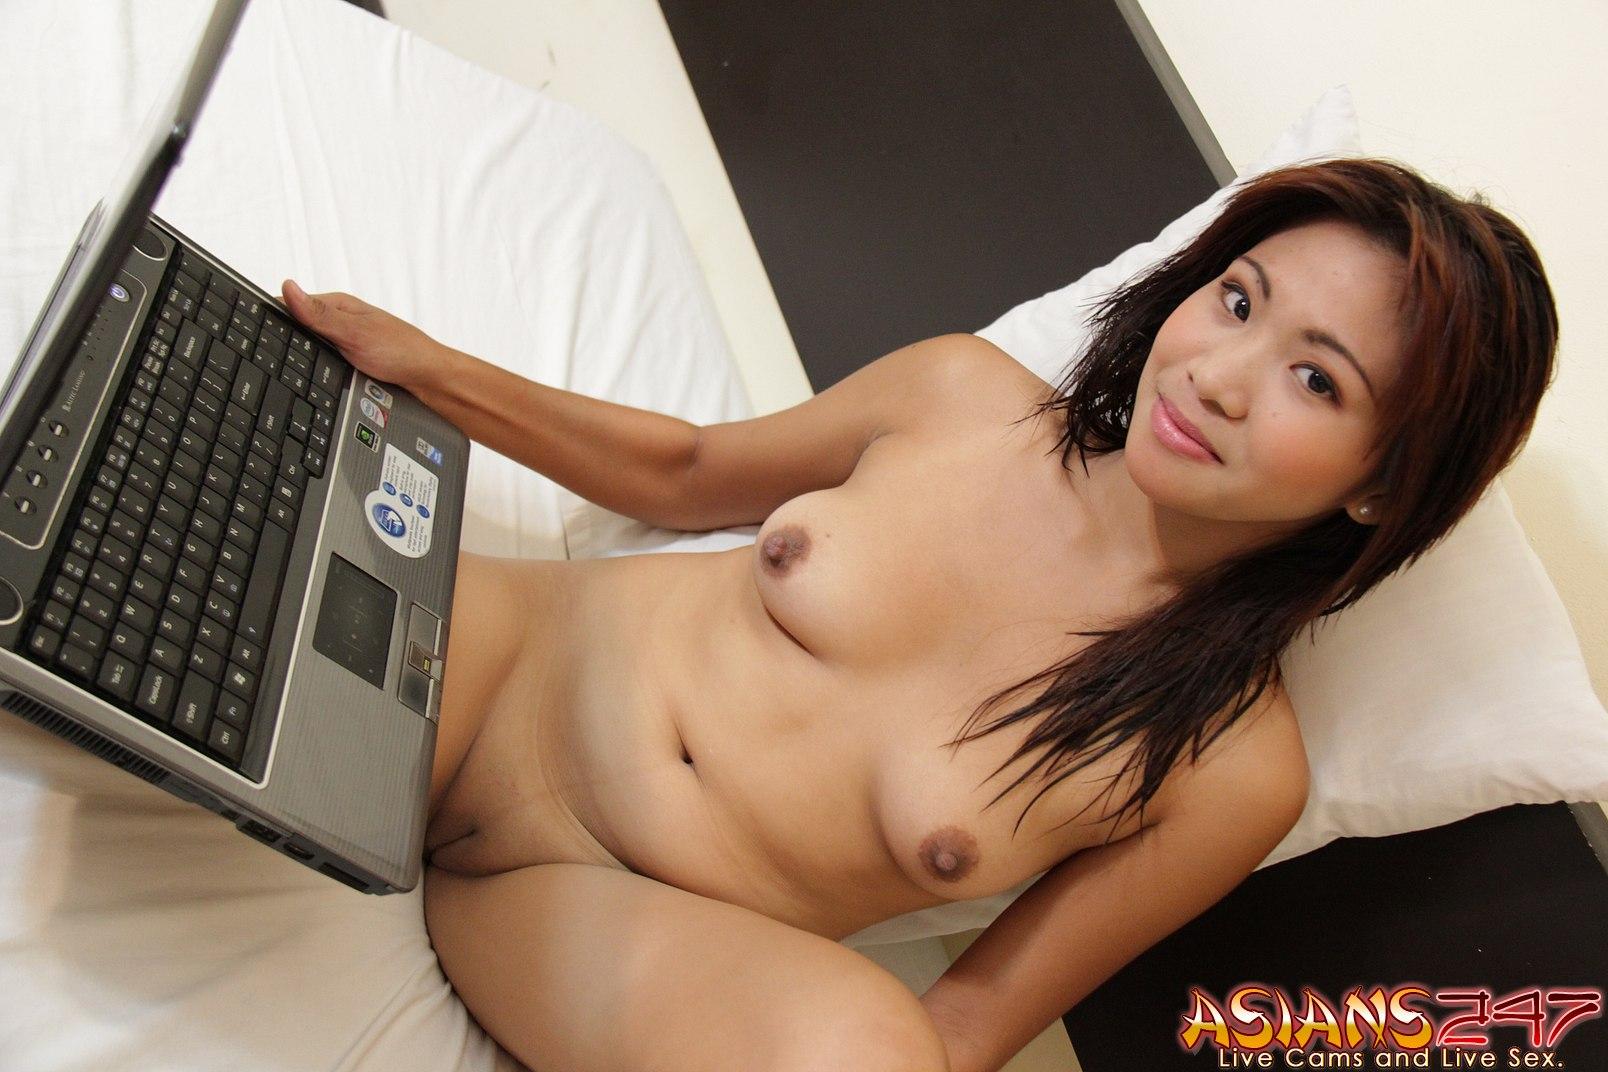 free live bøsse erotic cams super sex